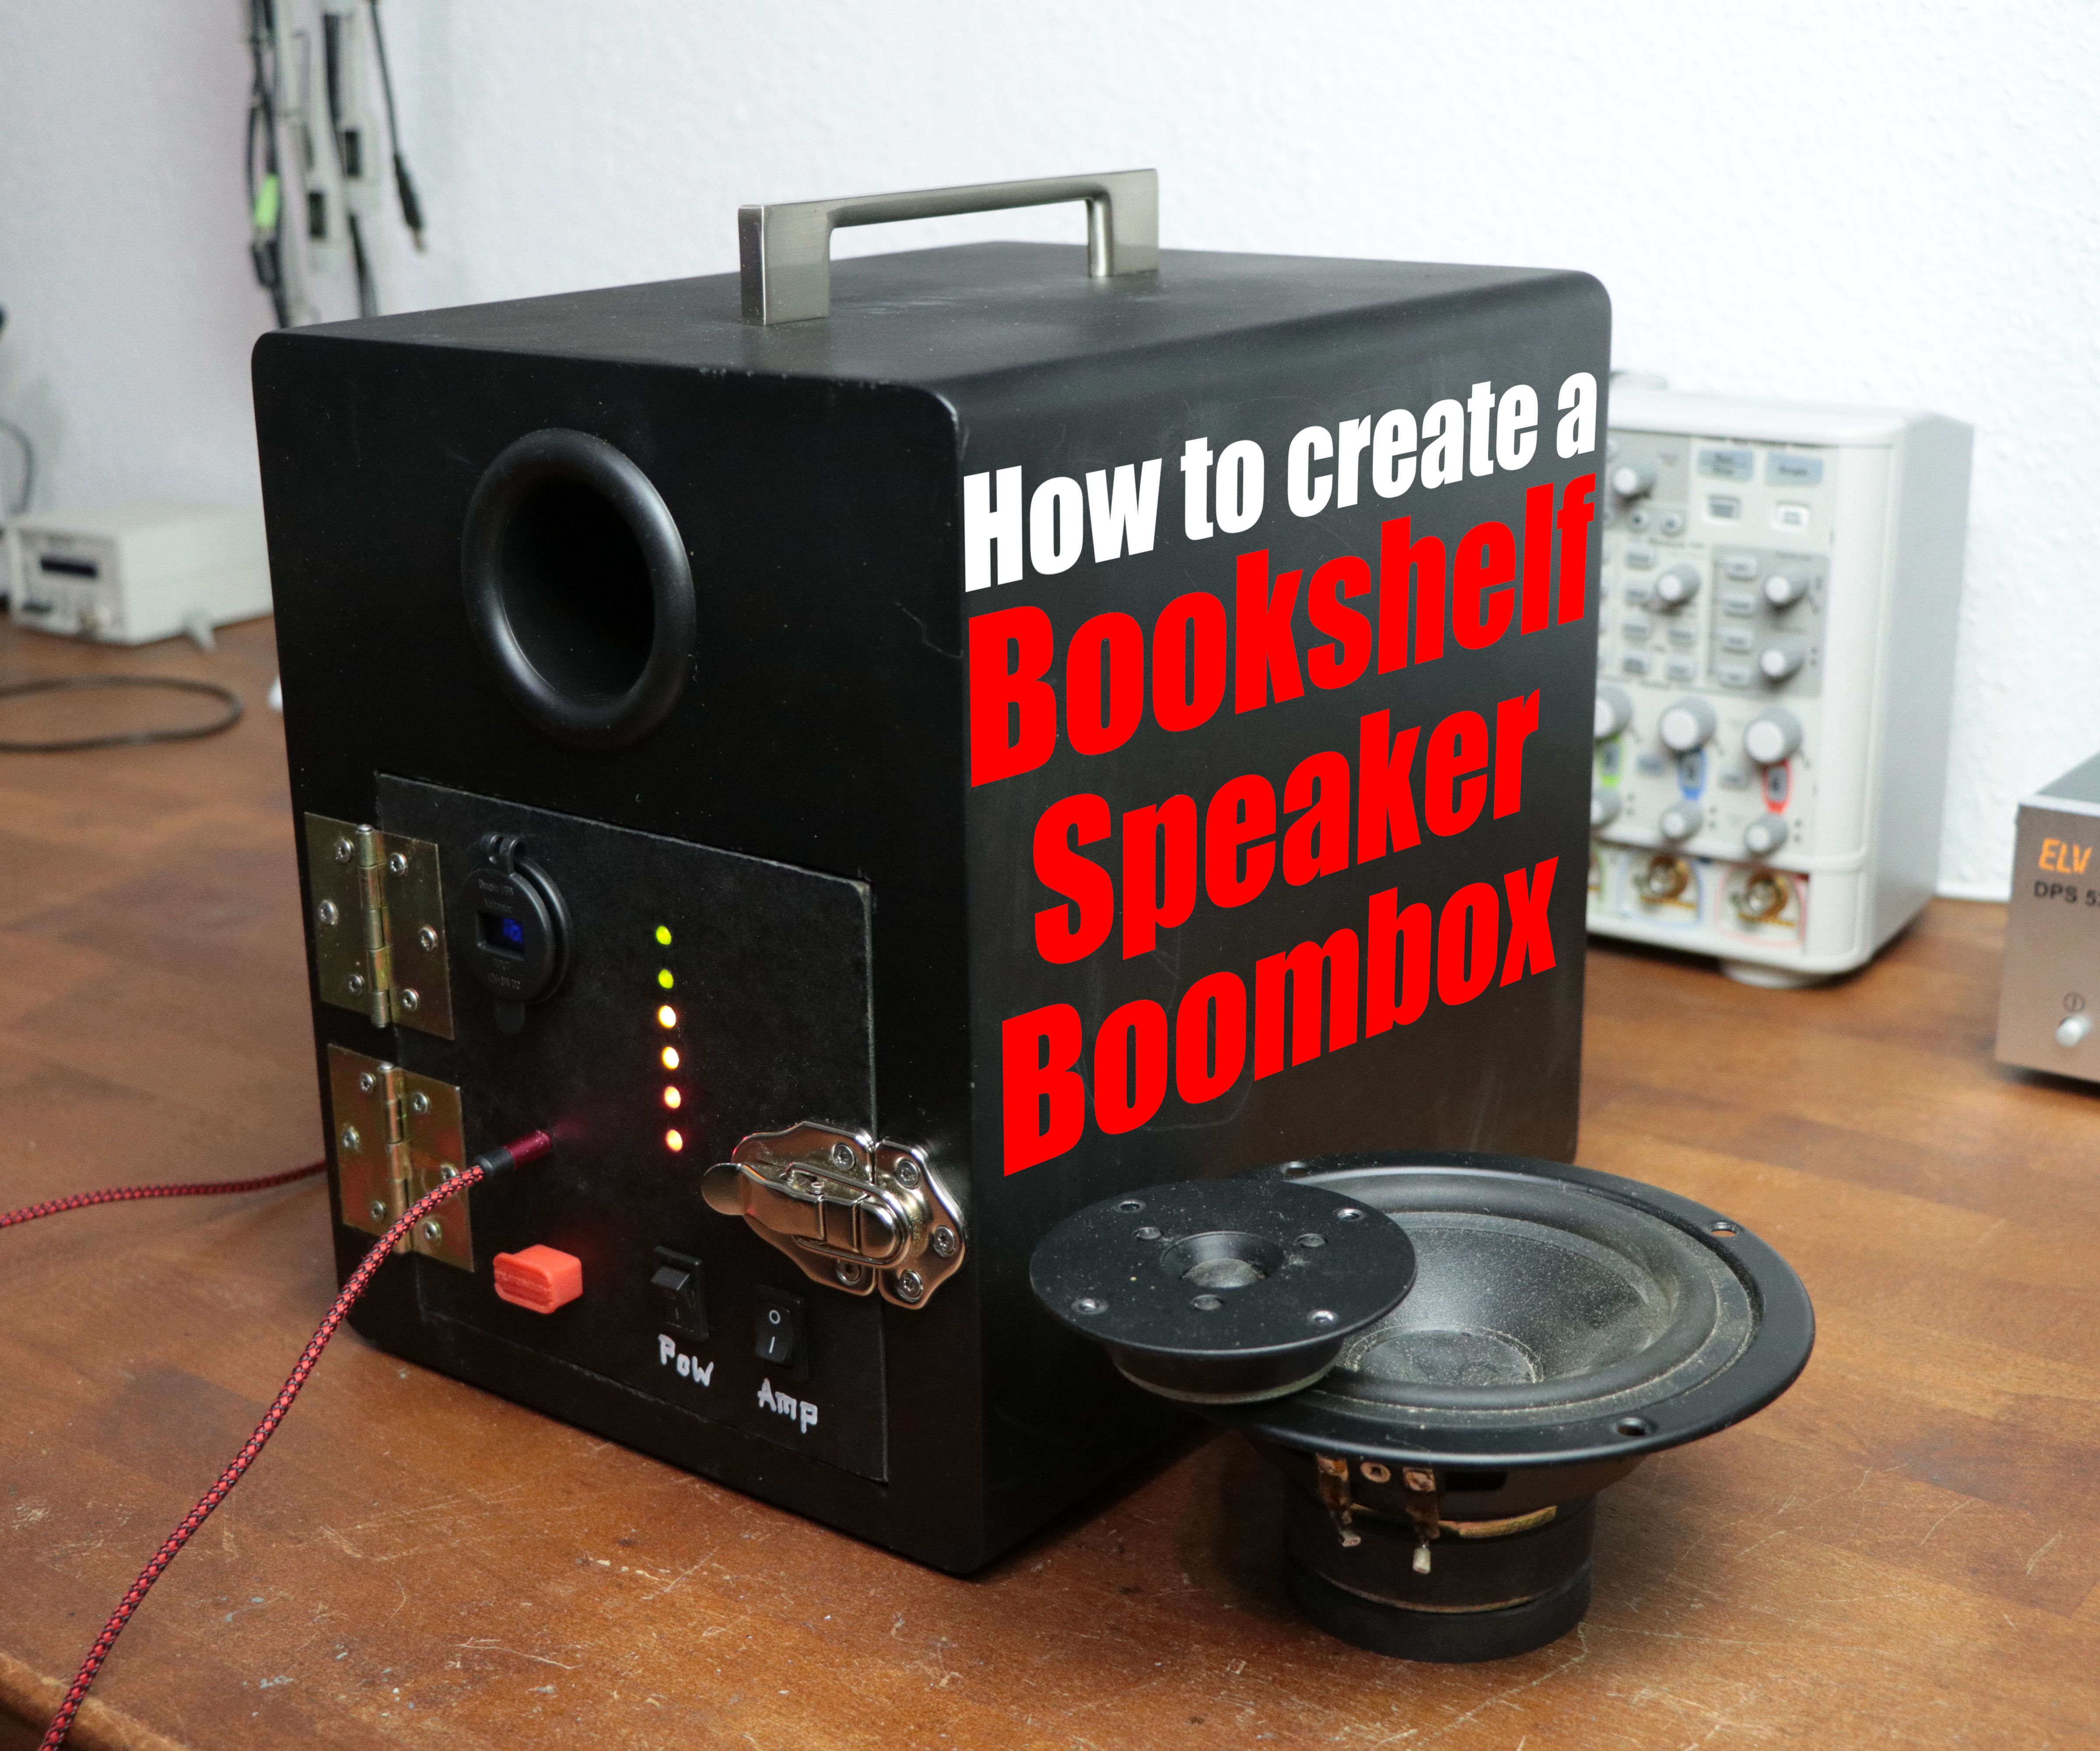 How to Create a Bookshelf Speaker Boombox